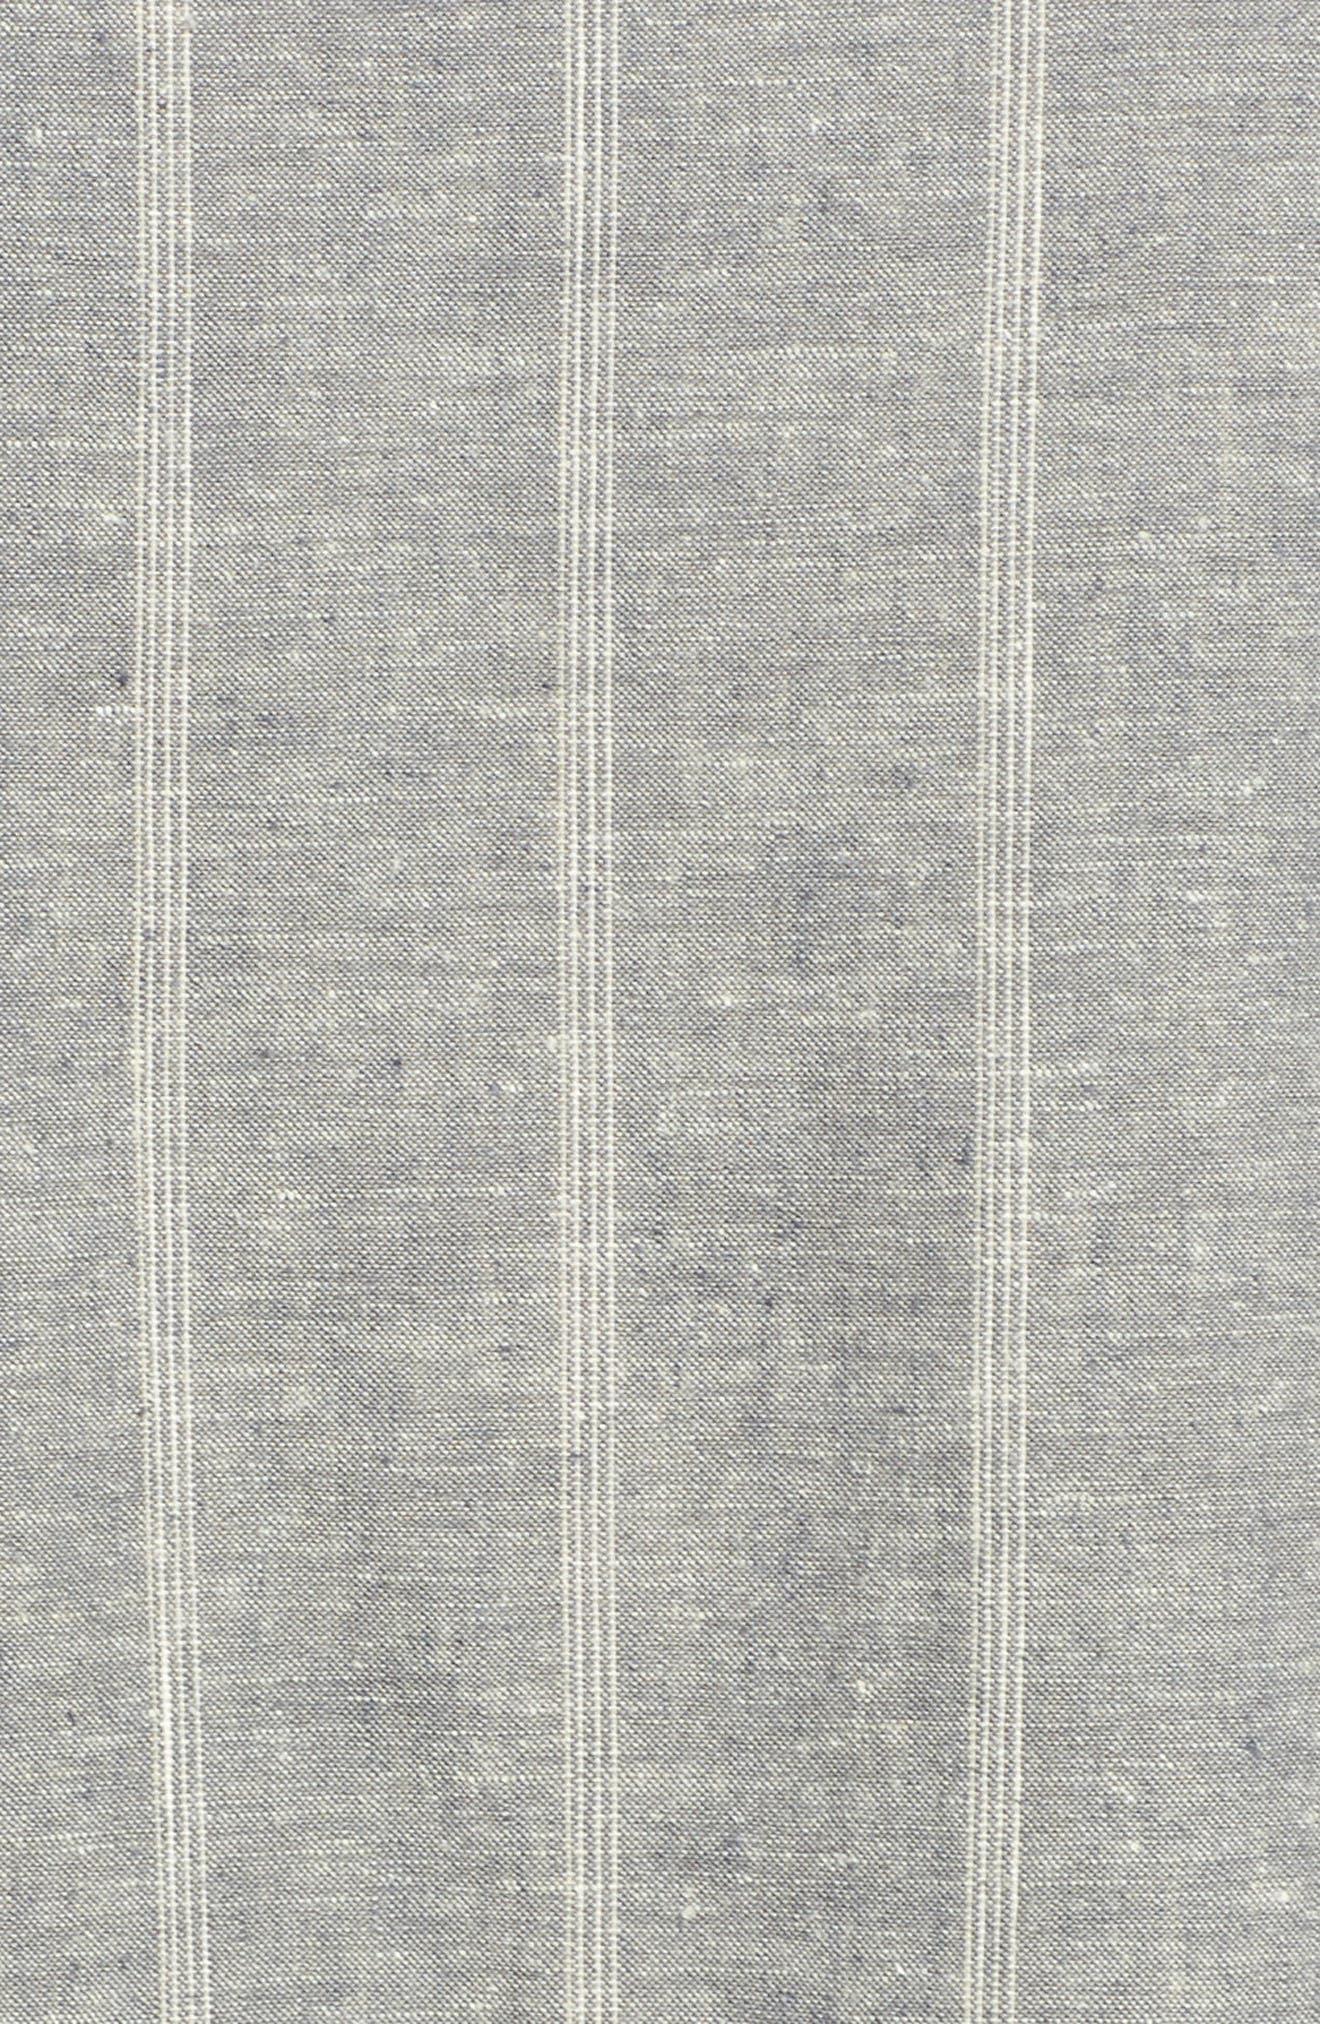 EILEEN FISHER,                             Stripe Hemp & Organic Cotton Shift Dress,                             Alternate thumbnail 6, color,                             MOON